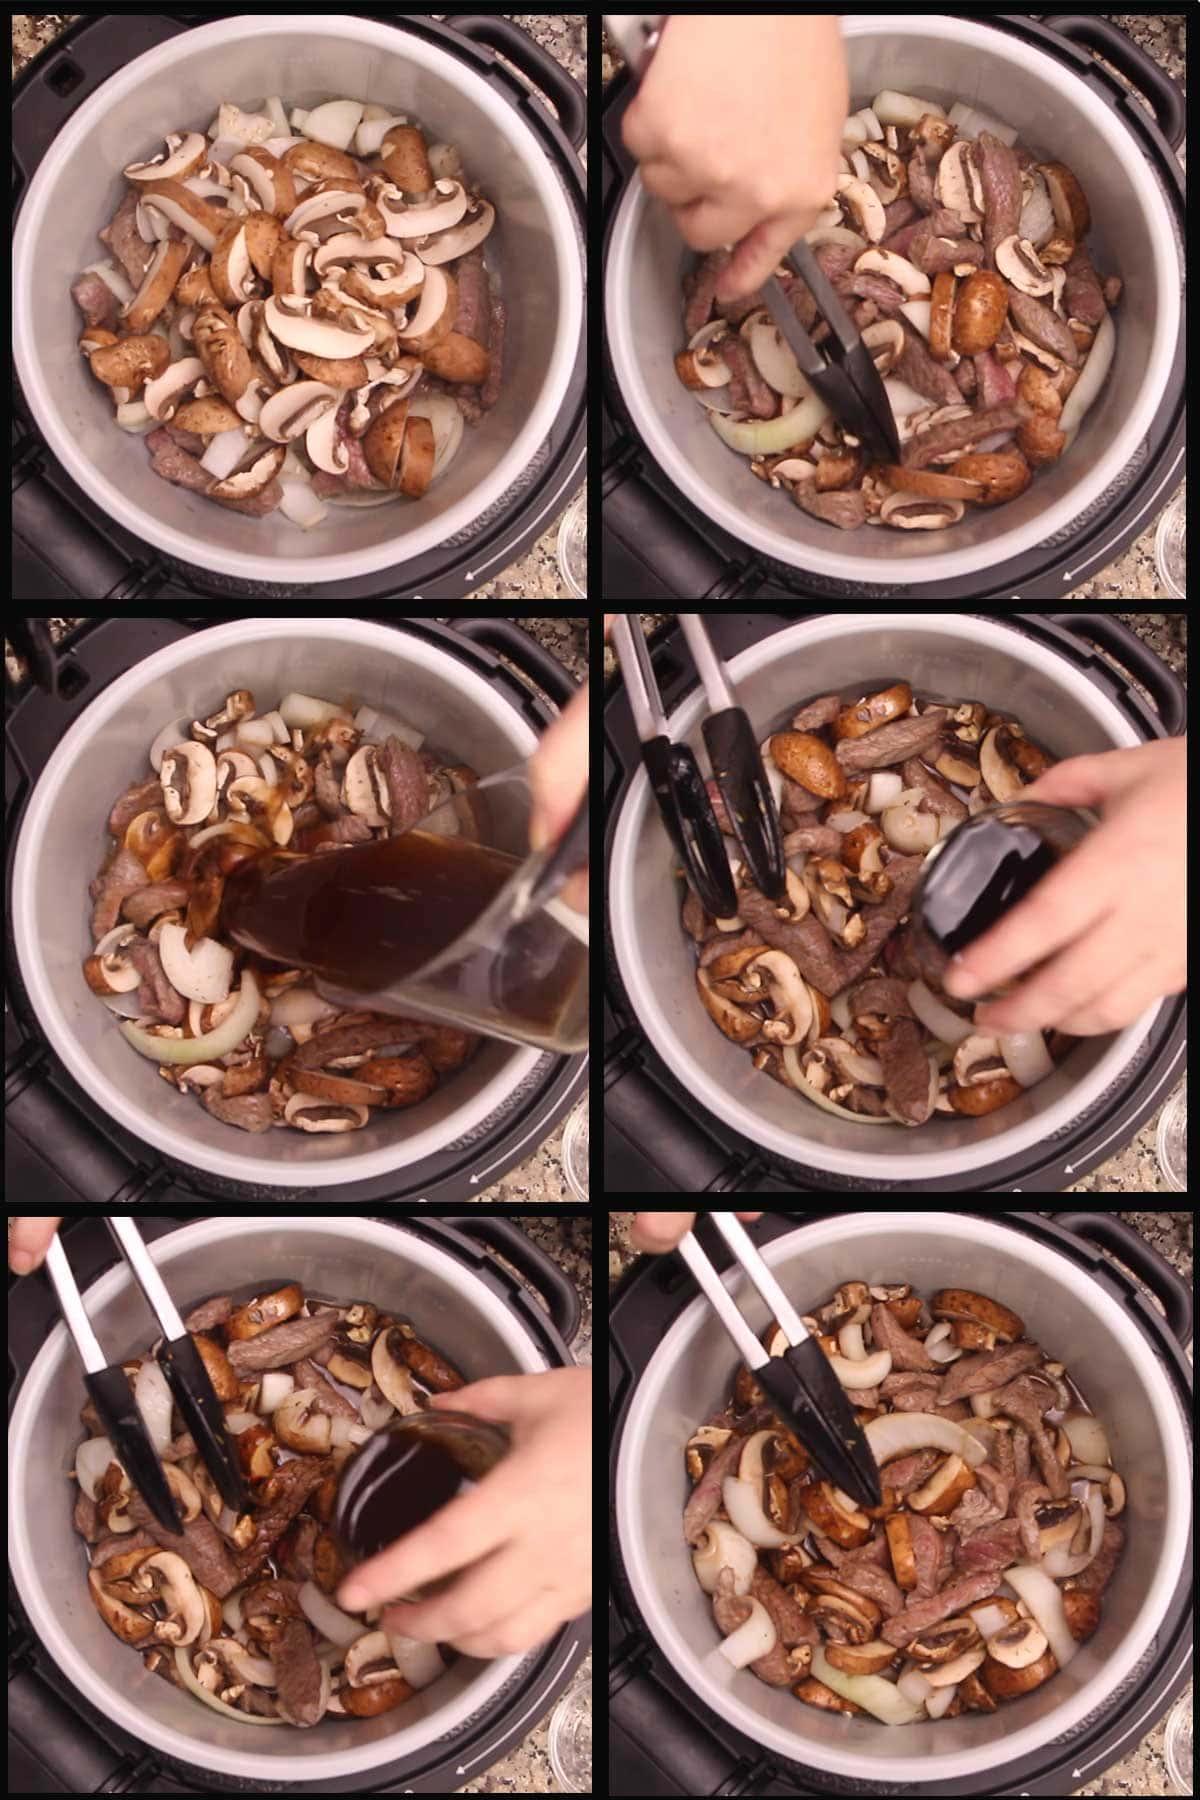 adding mushrooms and deglazing the pot